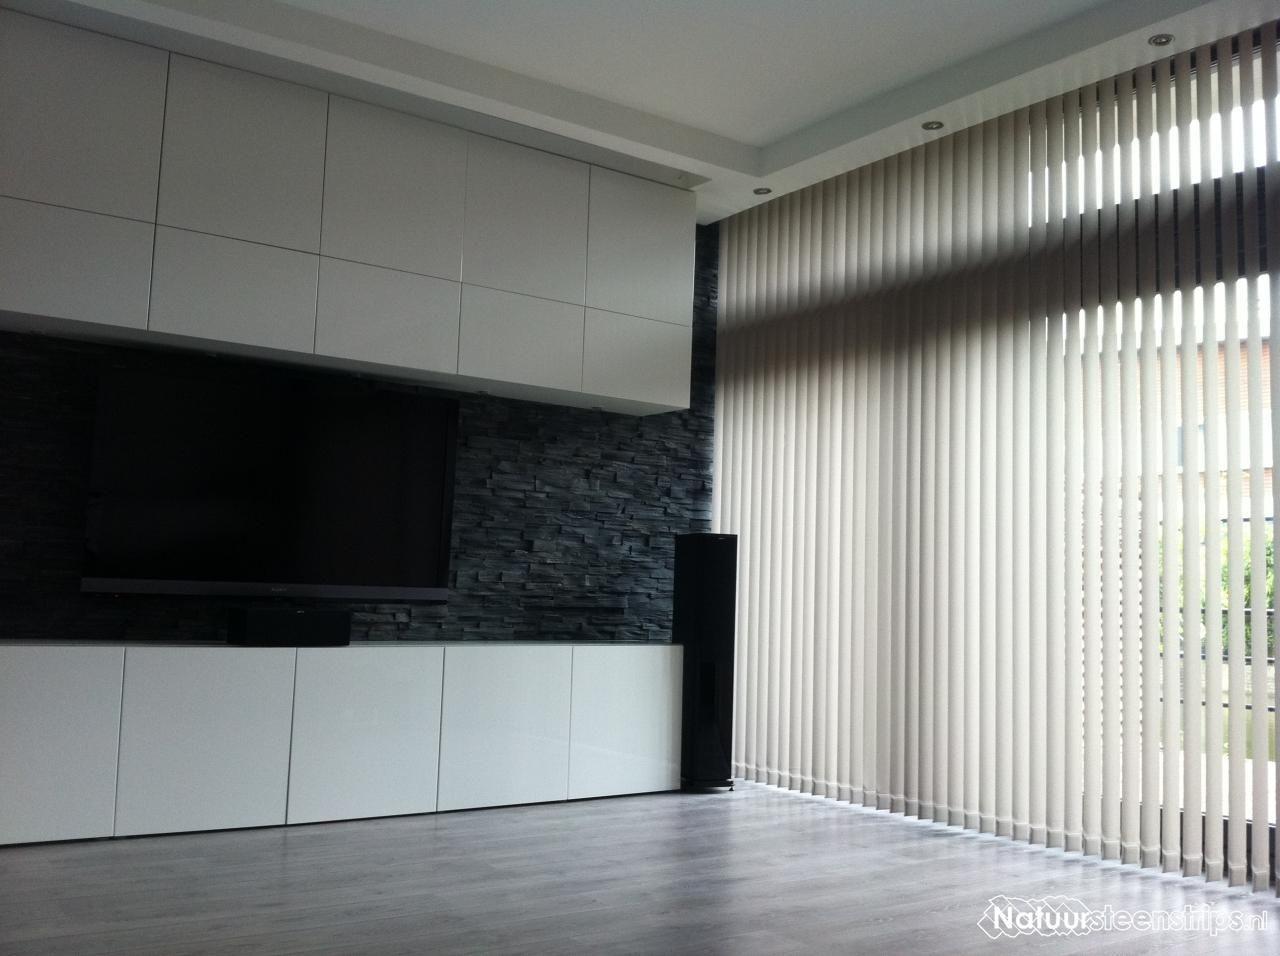 Zwarte lei natuursteenstrips woonkamer wand.   home   Pinterest